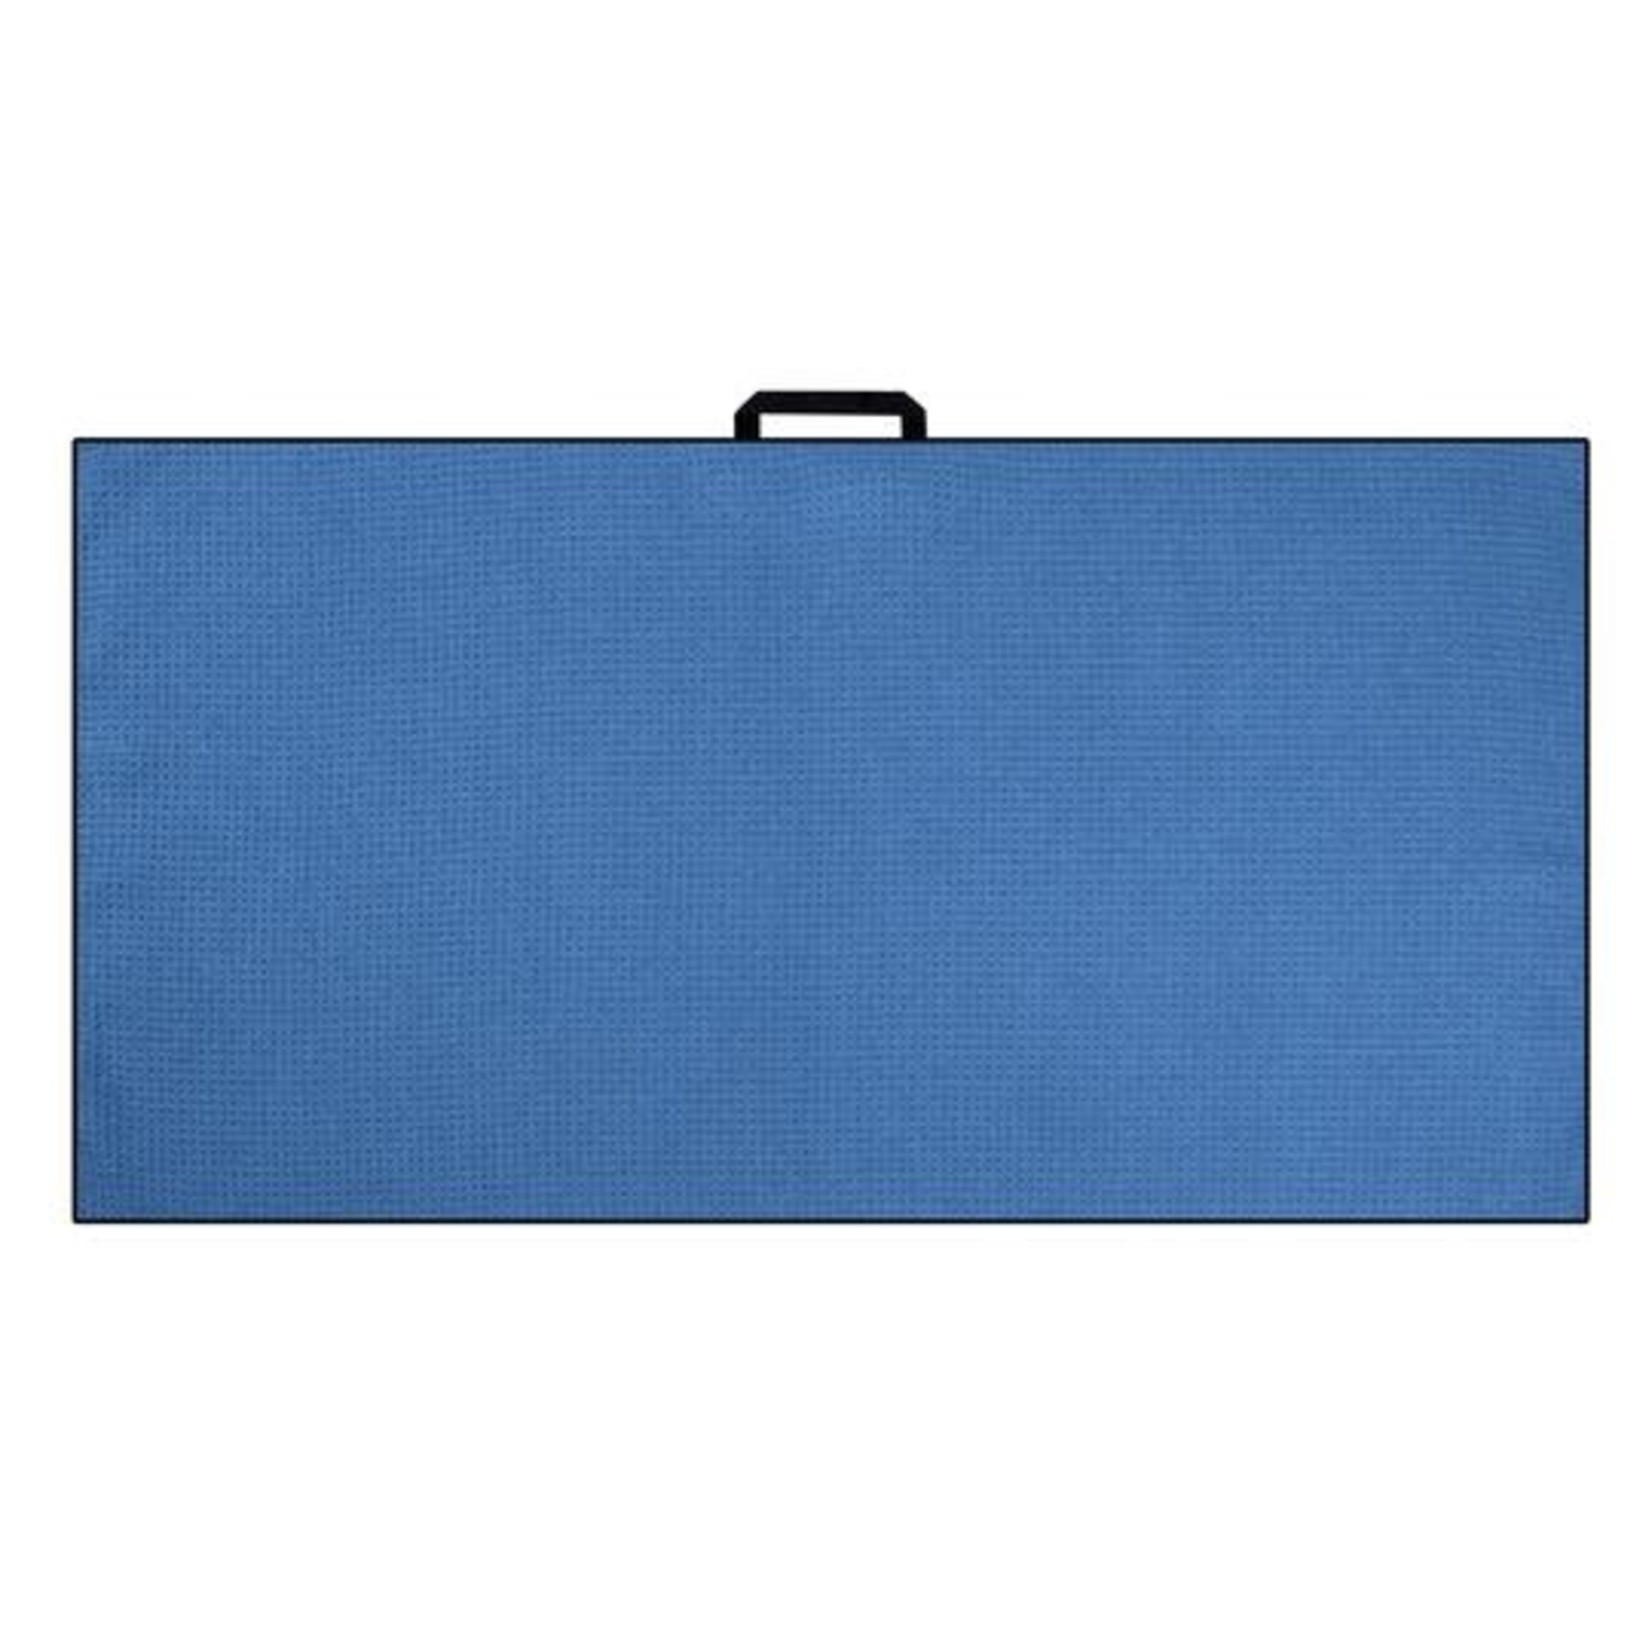 Devant Devant handdoek microfiber